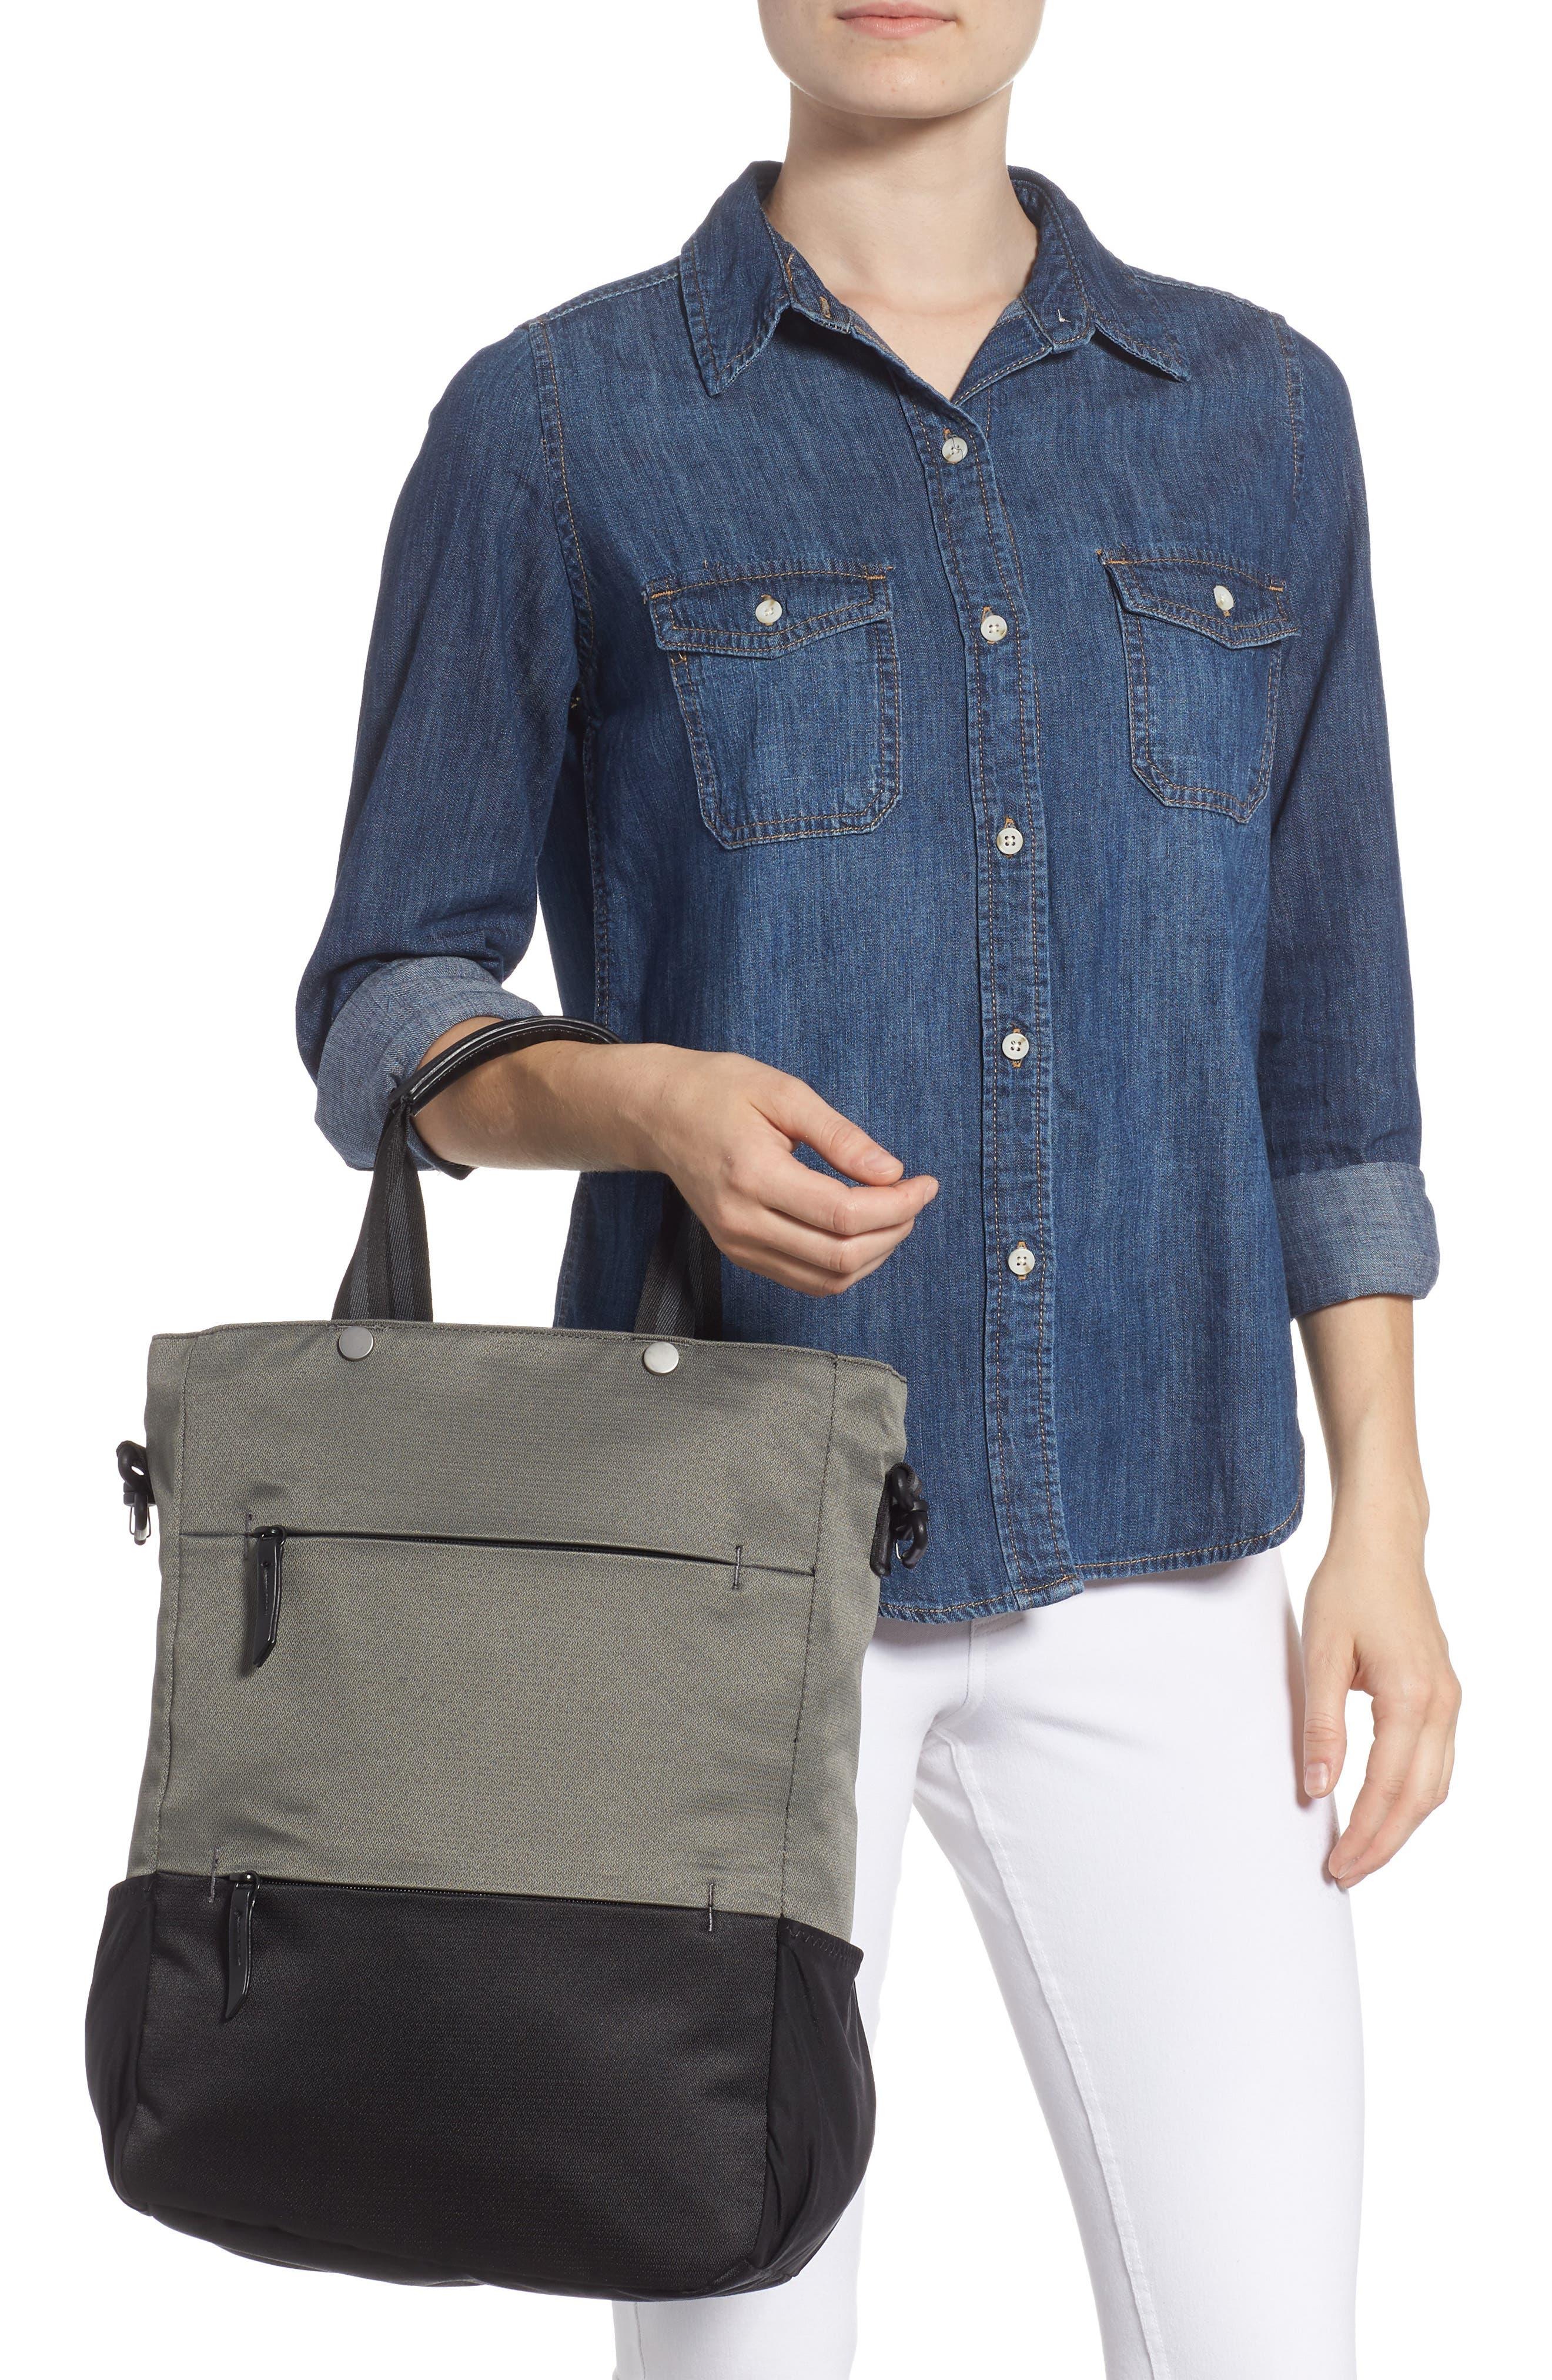 Camden RFID Convertible Backpack,                             Alternate thumbnail 3, color,                             GREY FLINT/ BLACK